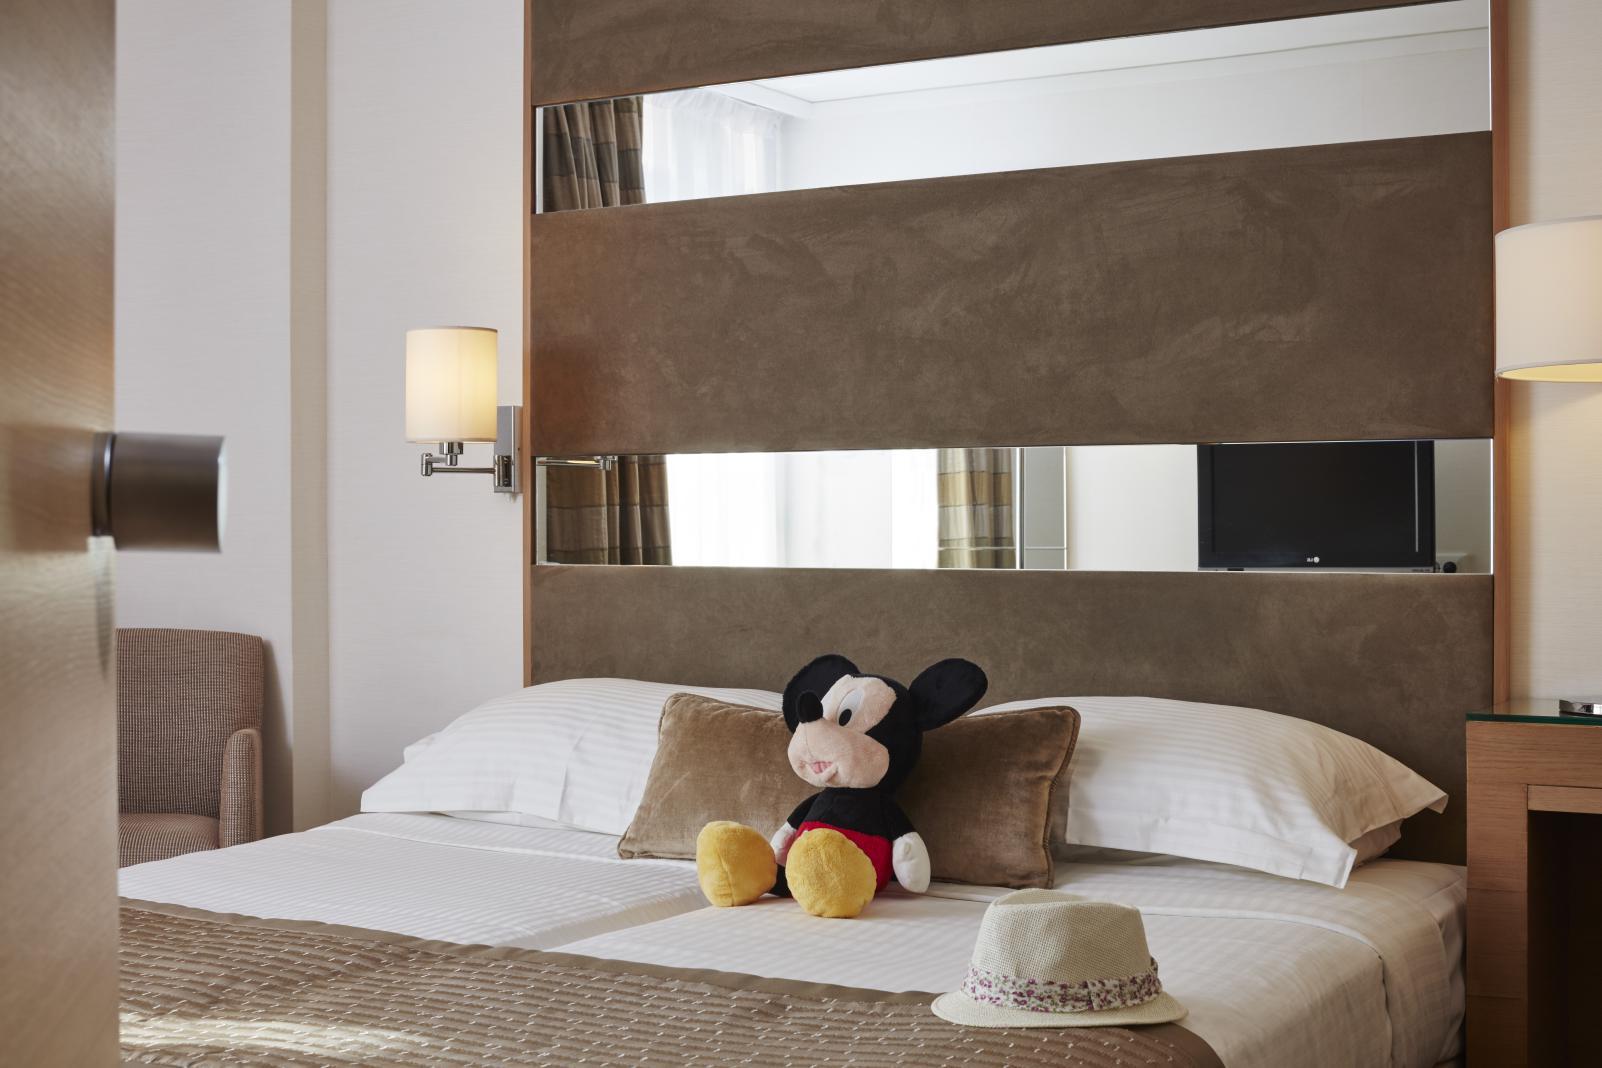 Galaxy hotel Heraklion KidsLoveGreece.com accommodation